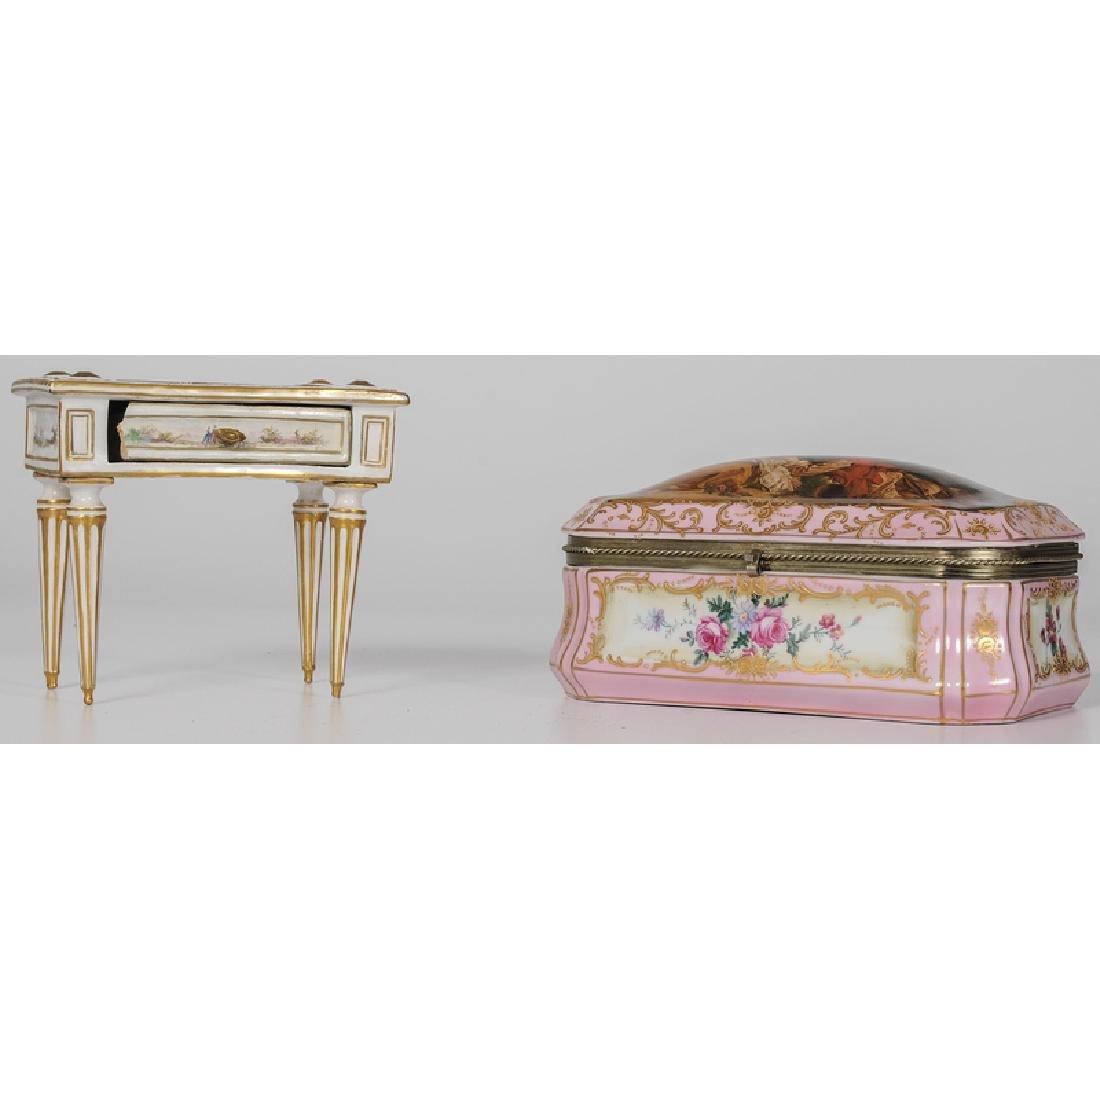 Marseilles Faience Diminutive Desk and Porcelain